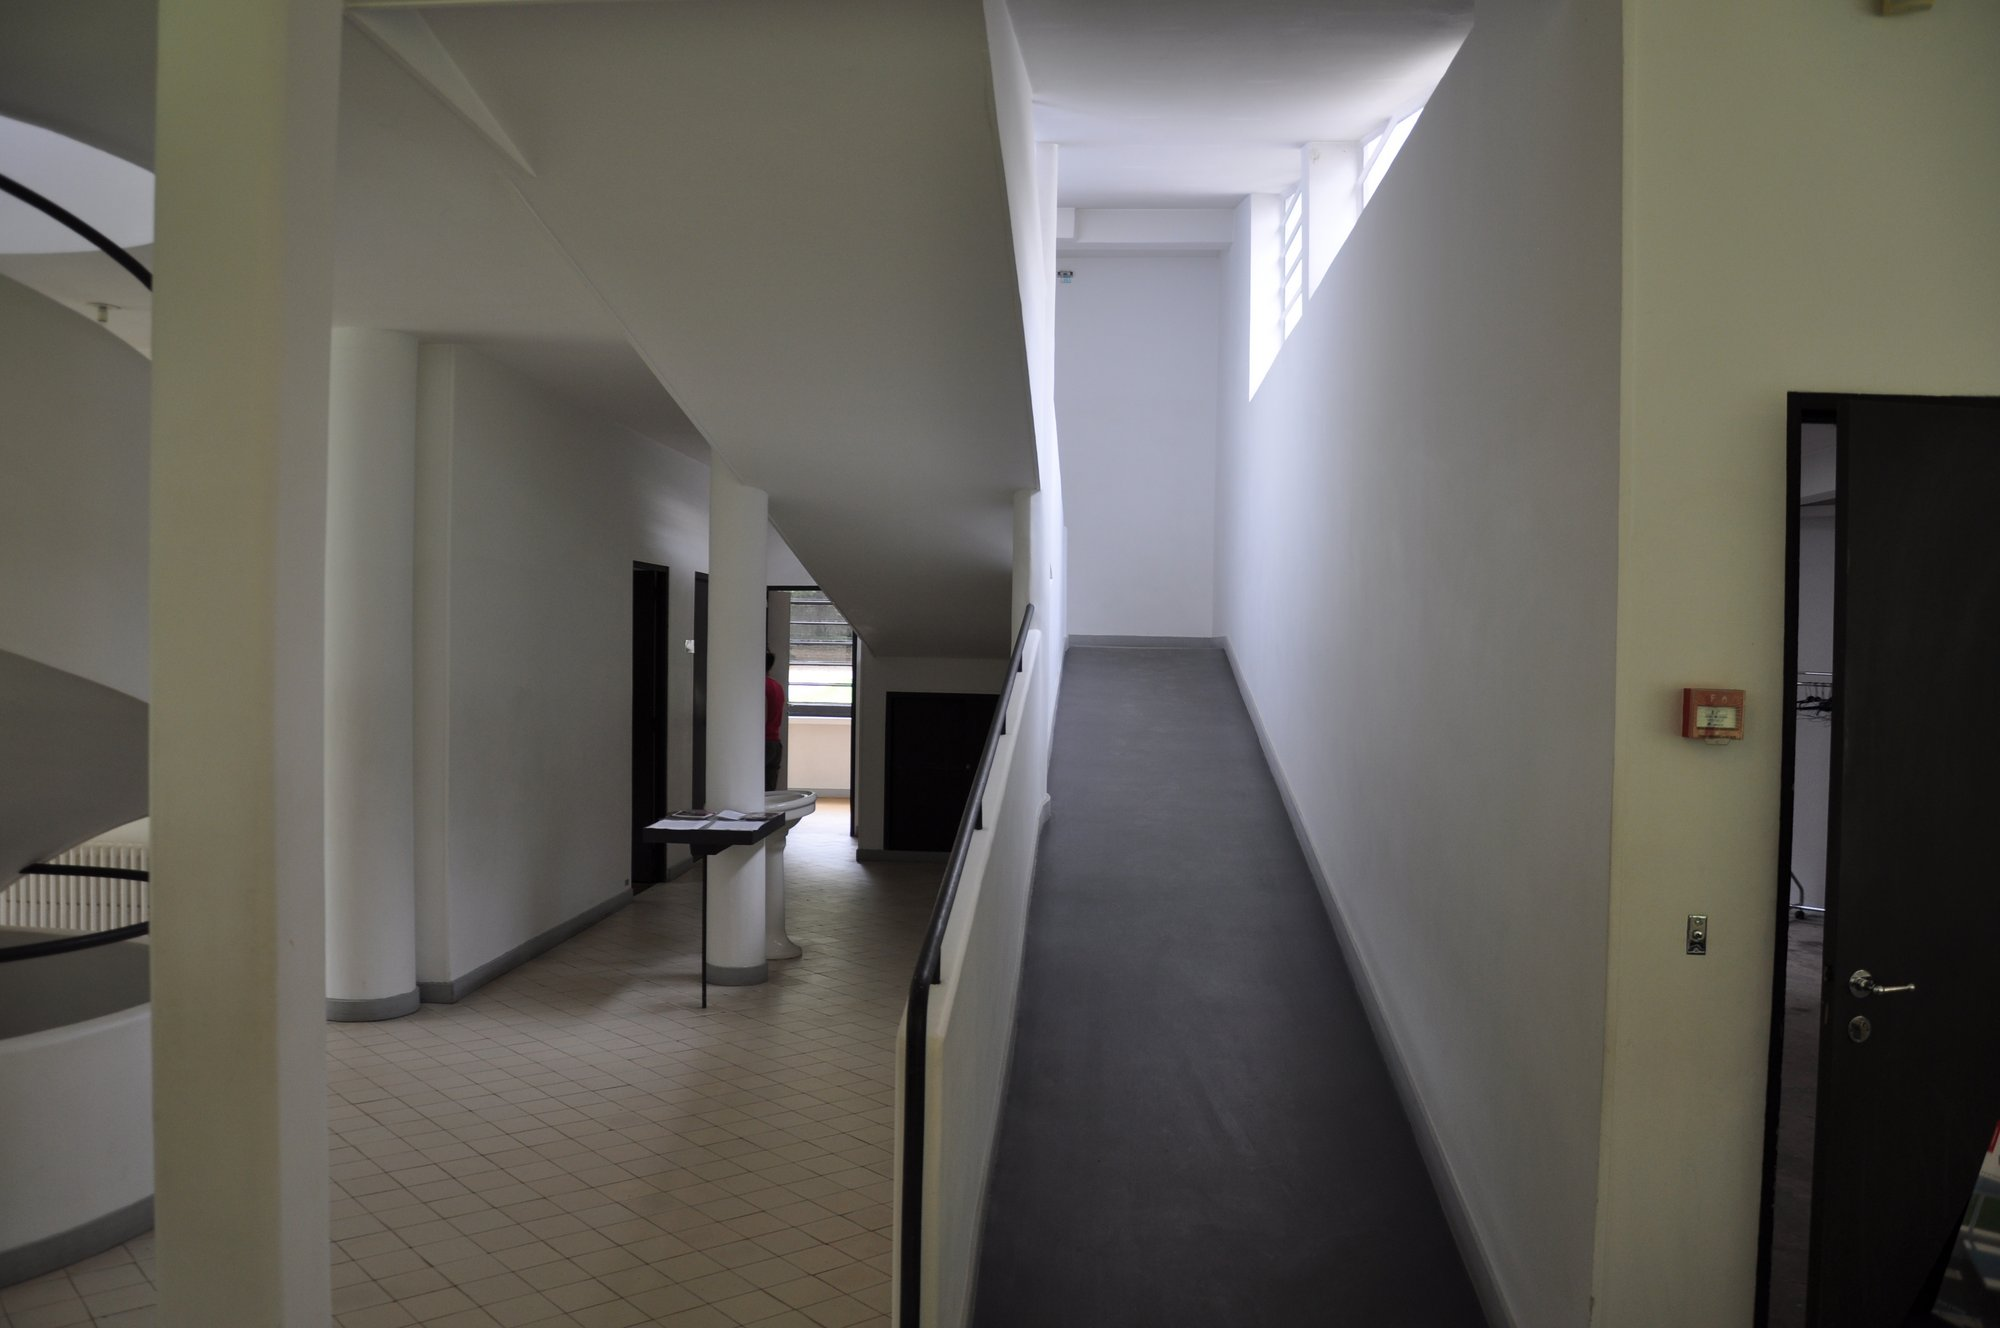 Entry Level Interior Design Jobs Near Me